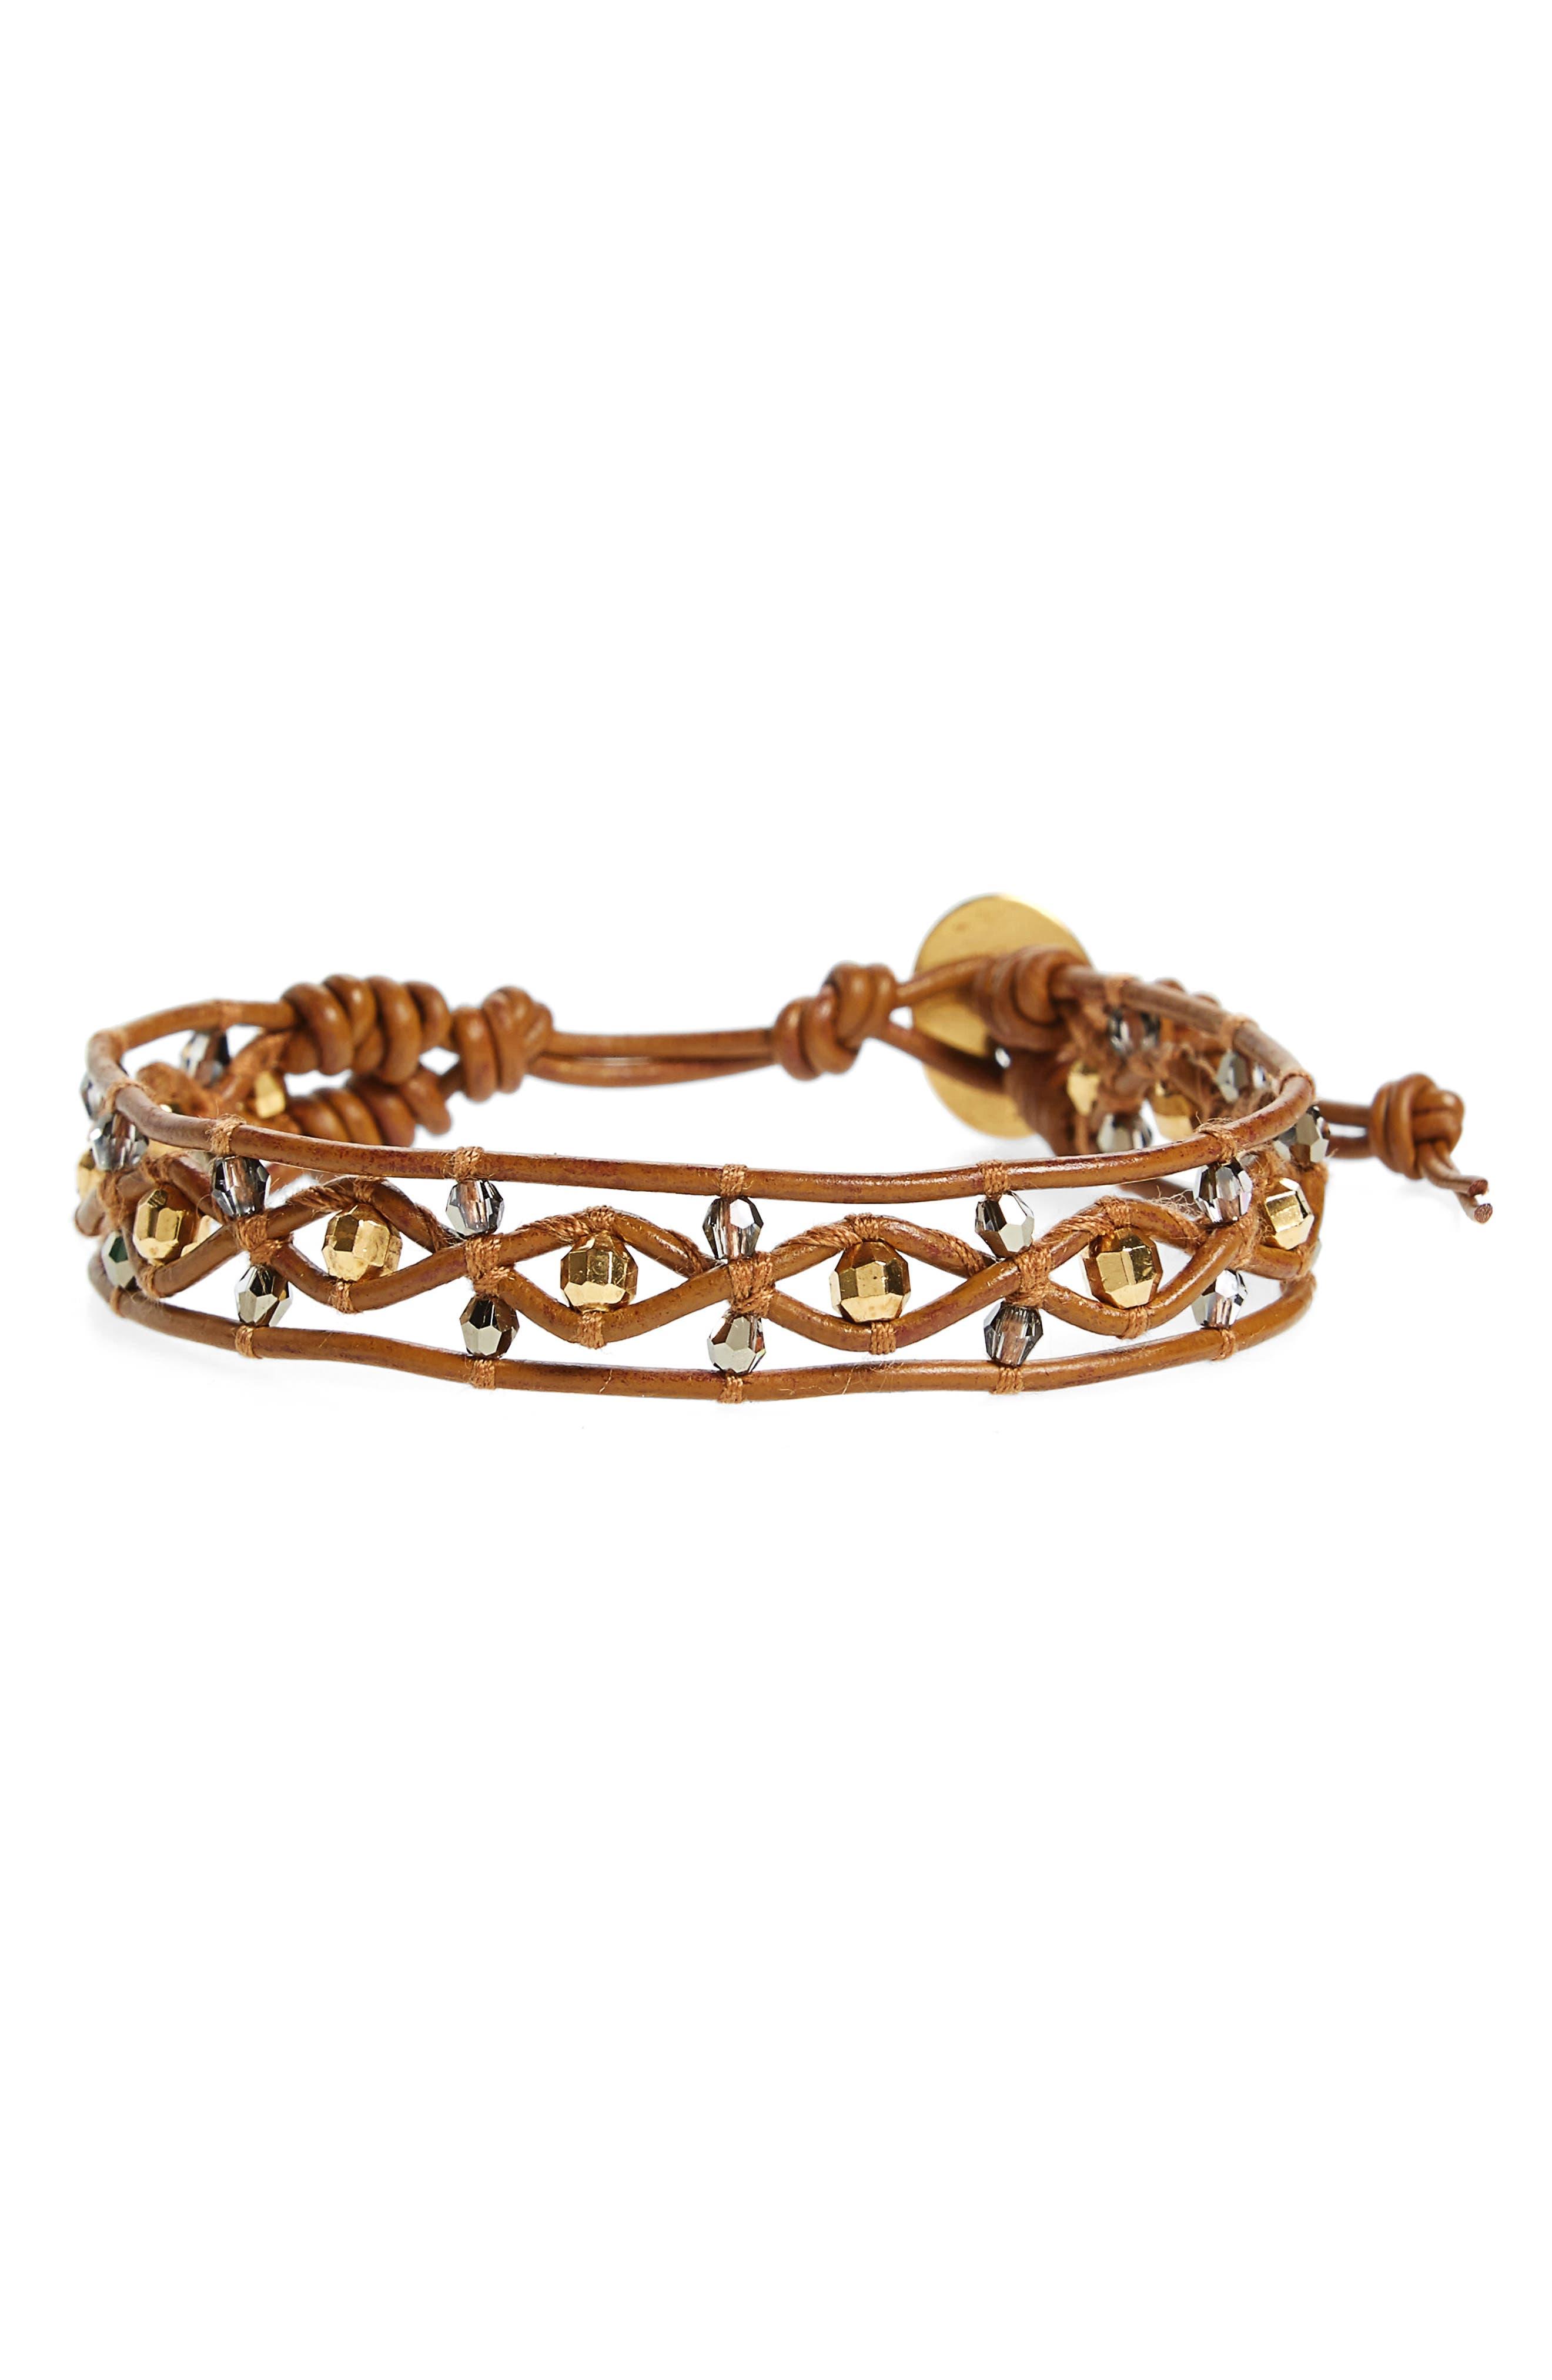 Beaded Leather Bracelet,                             Main thumbnail 1, color,                             Gold